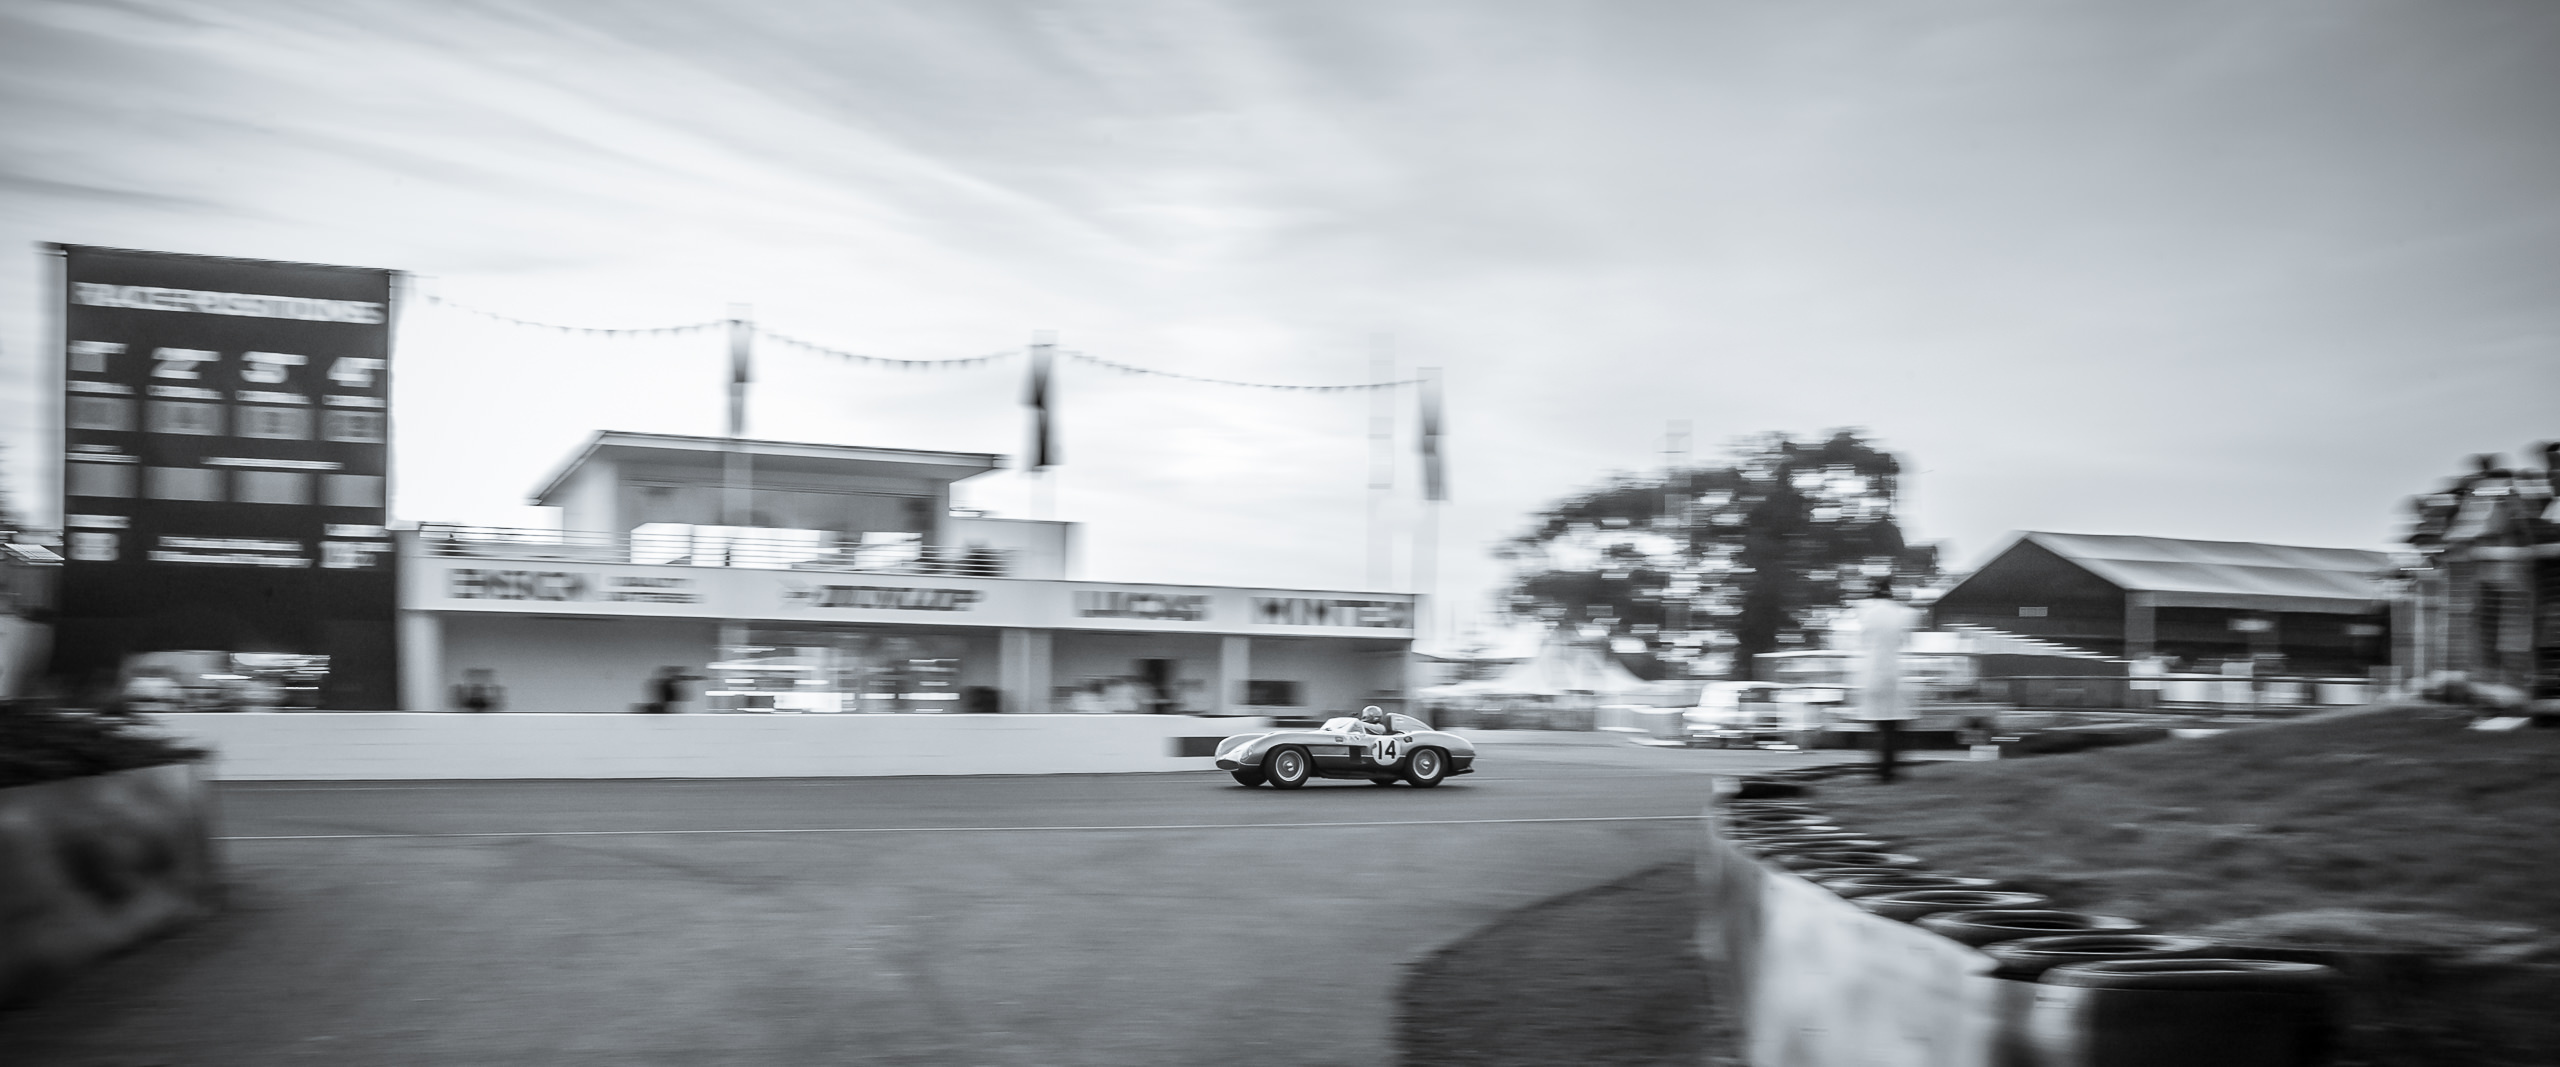 Wayfinder Workshop Goodwood Revival Aston Martin Dbr1 By Brett Leica Photographer